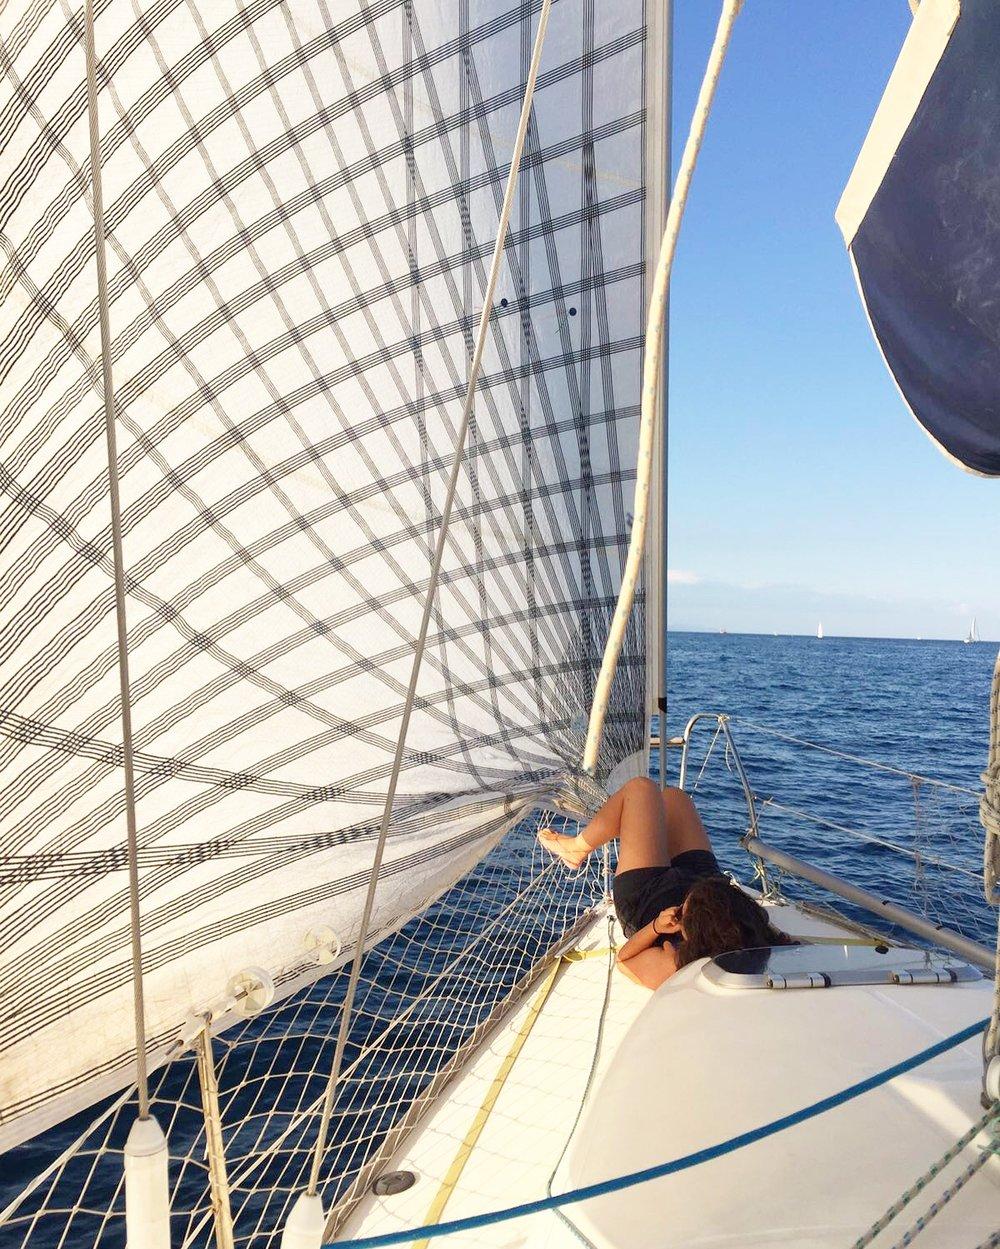 Hallie sailing off the coast of Barcelona - 3 Days*